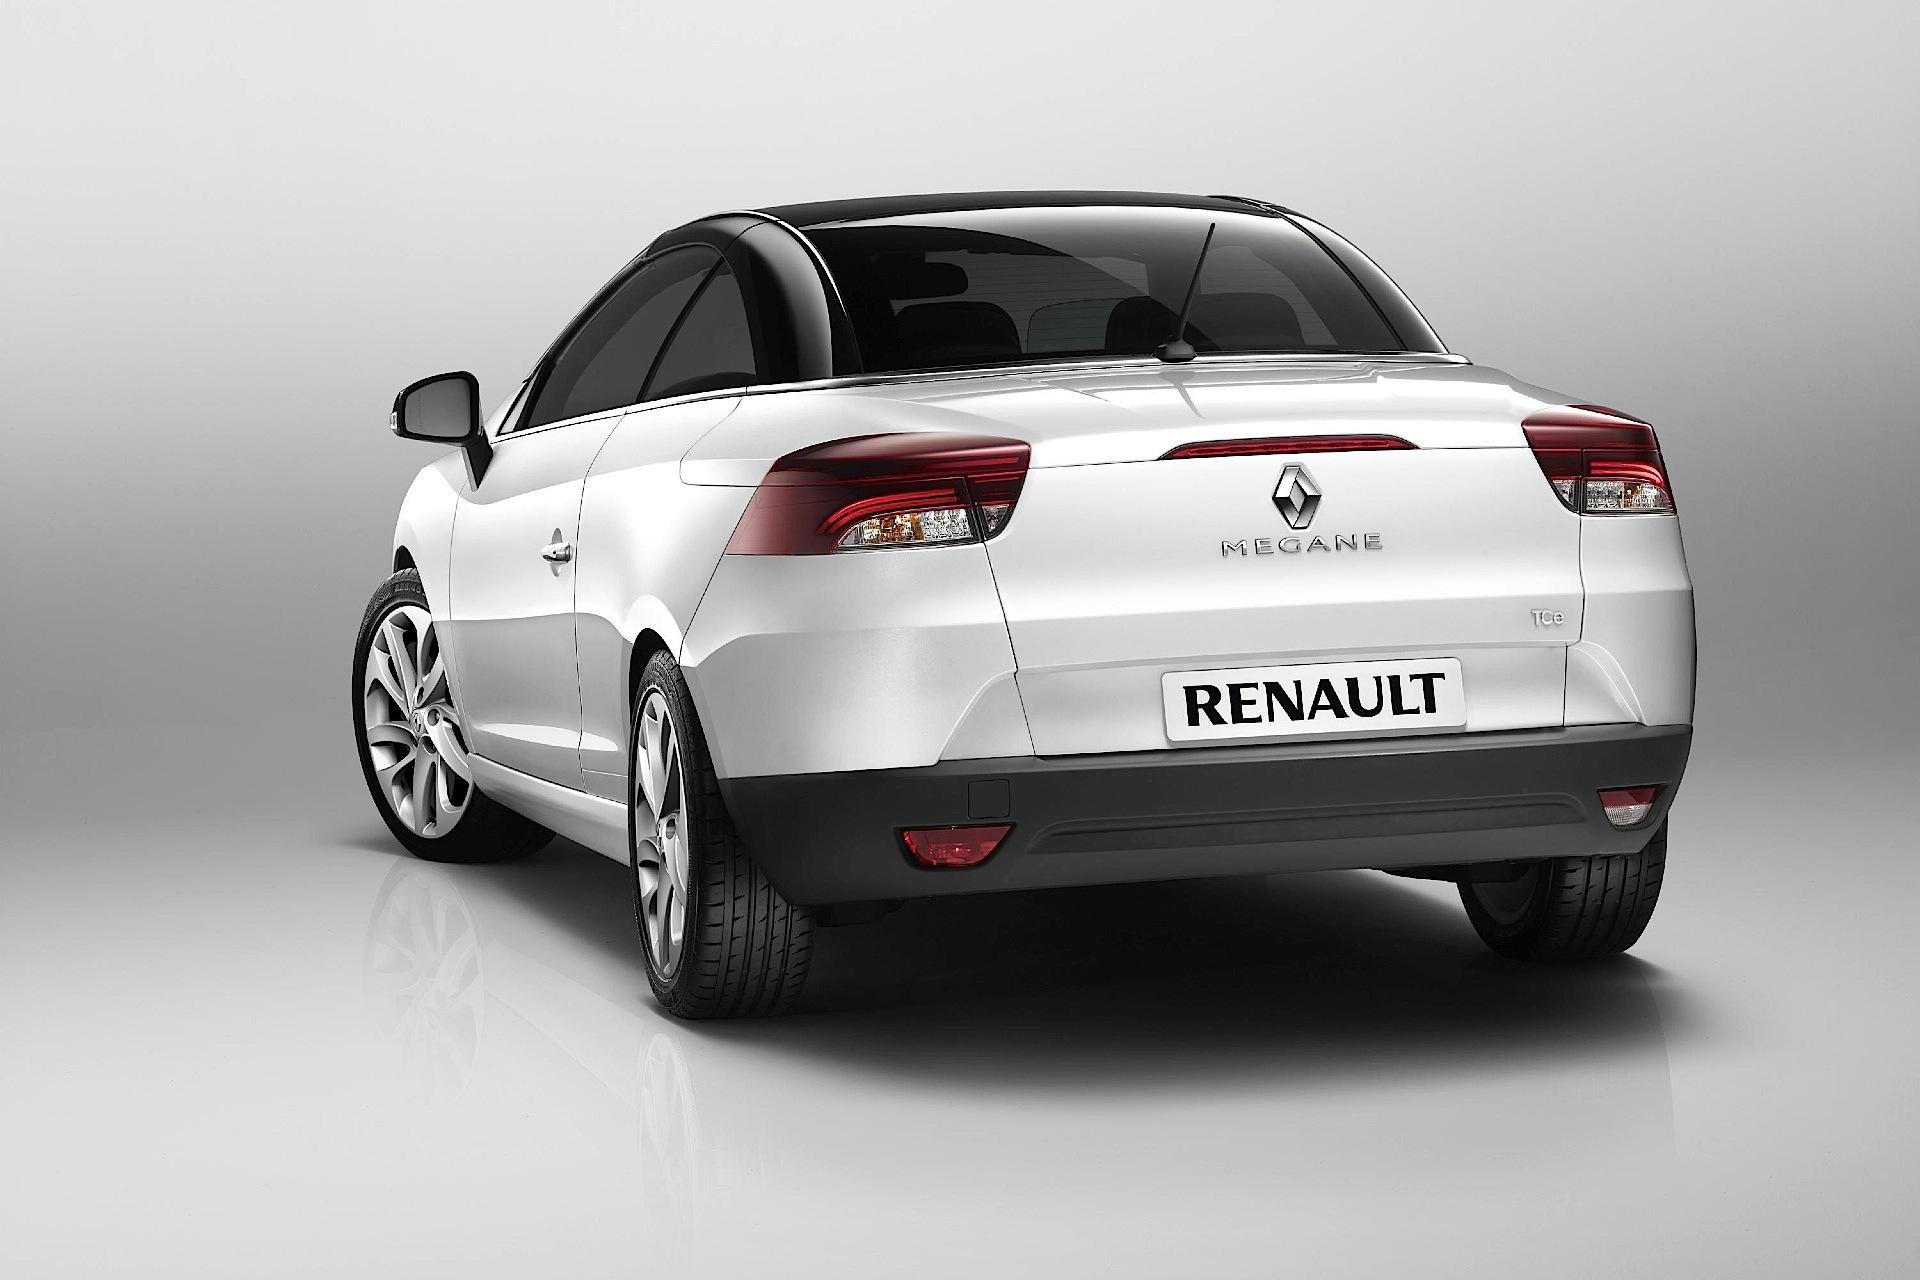 renault megane coupe cabrio specs 2010 2011 2012 2013 autoevolution. Black Bedroom Furniture Sets. Home Design Ideas